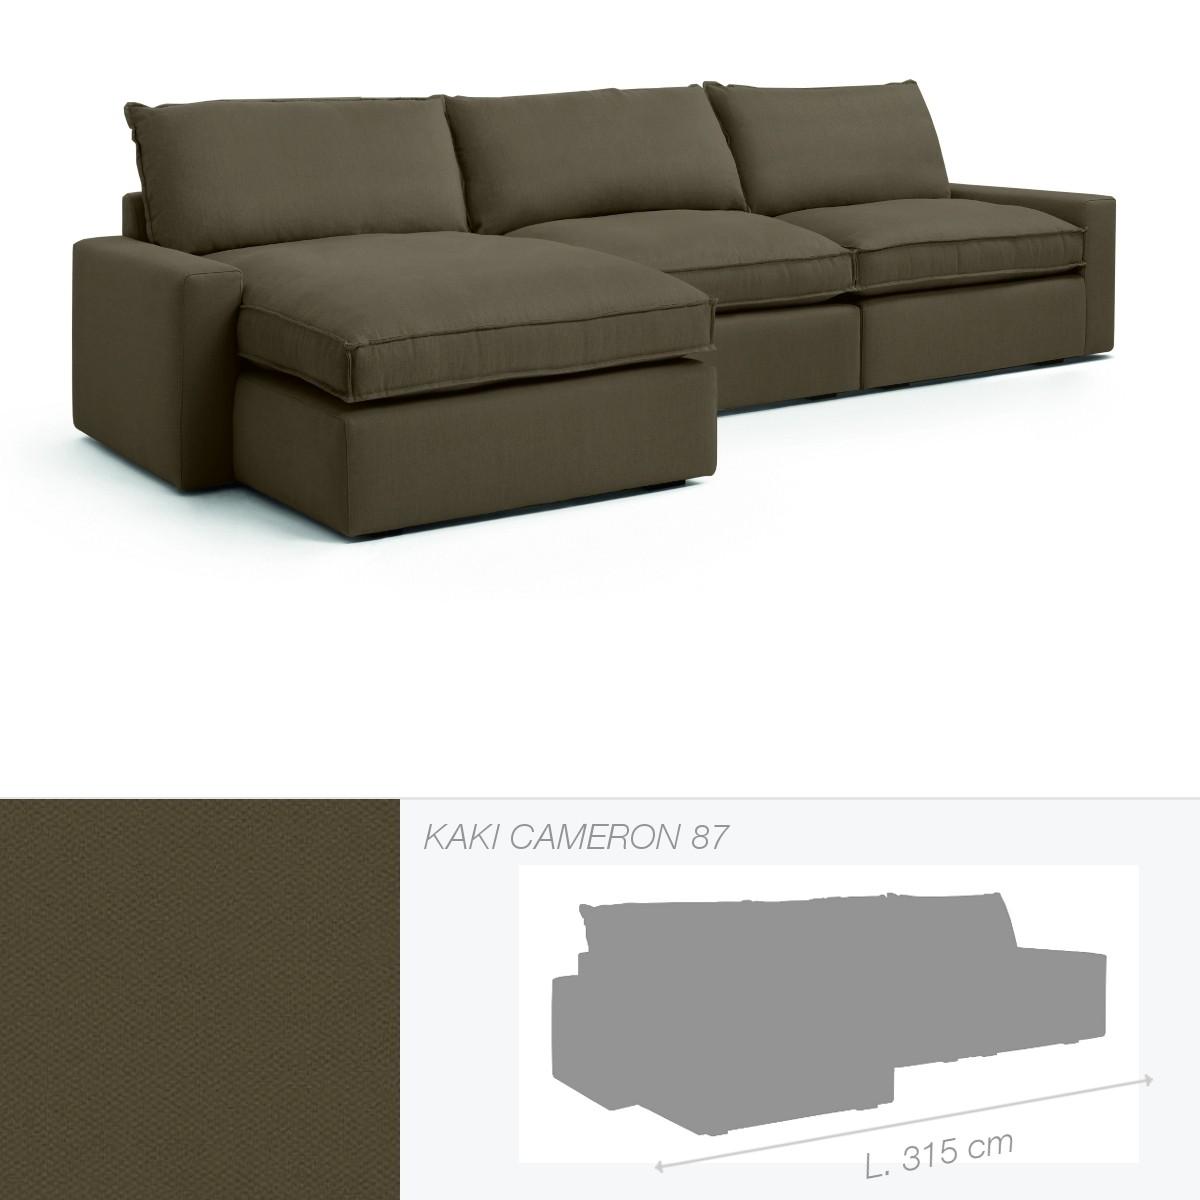 canap dakota de marie 39 s corner chauffeuse gauche kaki cameron 87. Black Bedroom Furniture Sets. Home Design Ideas